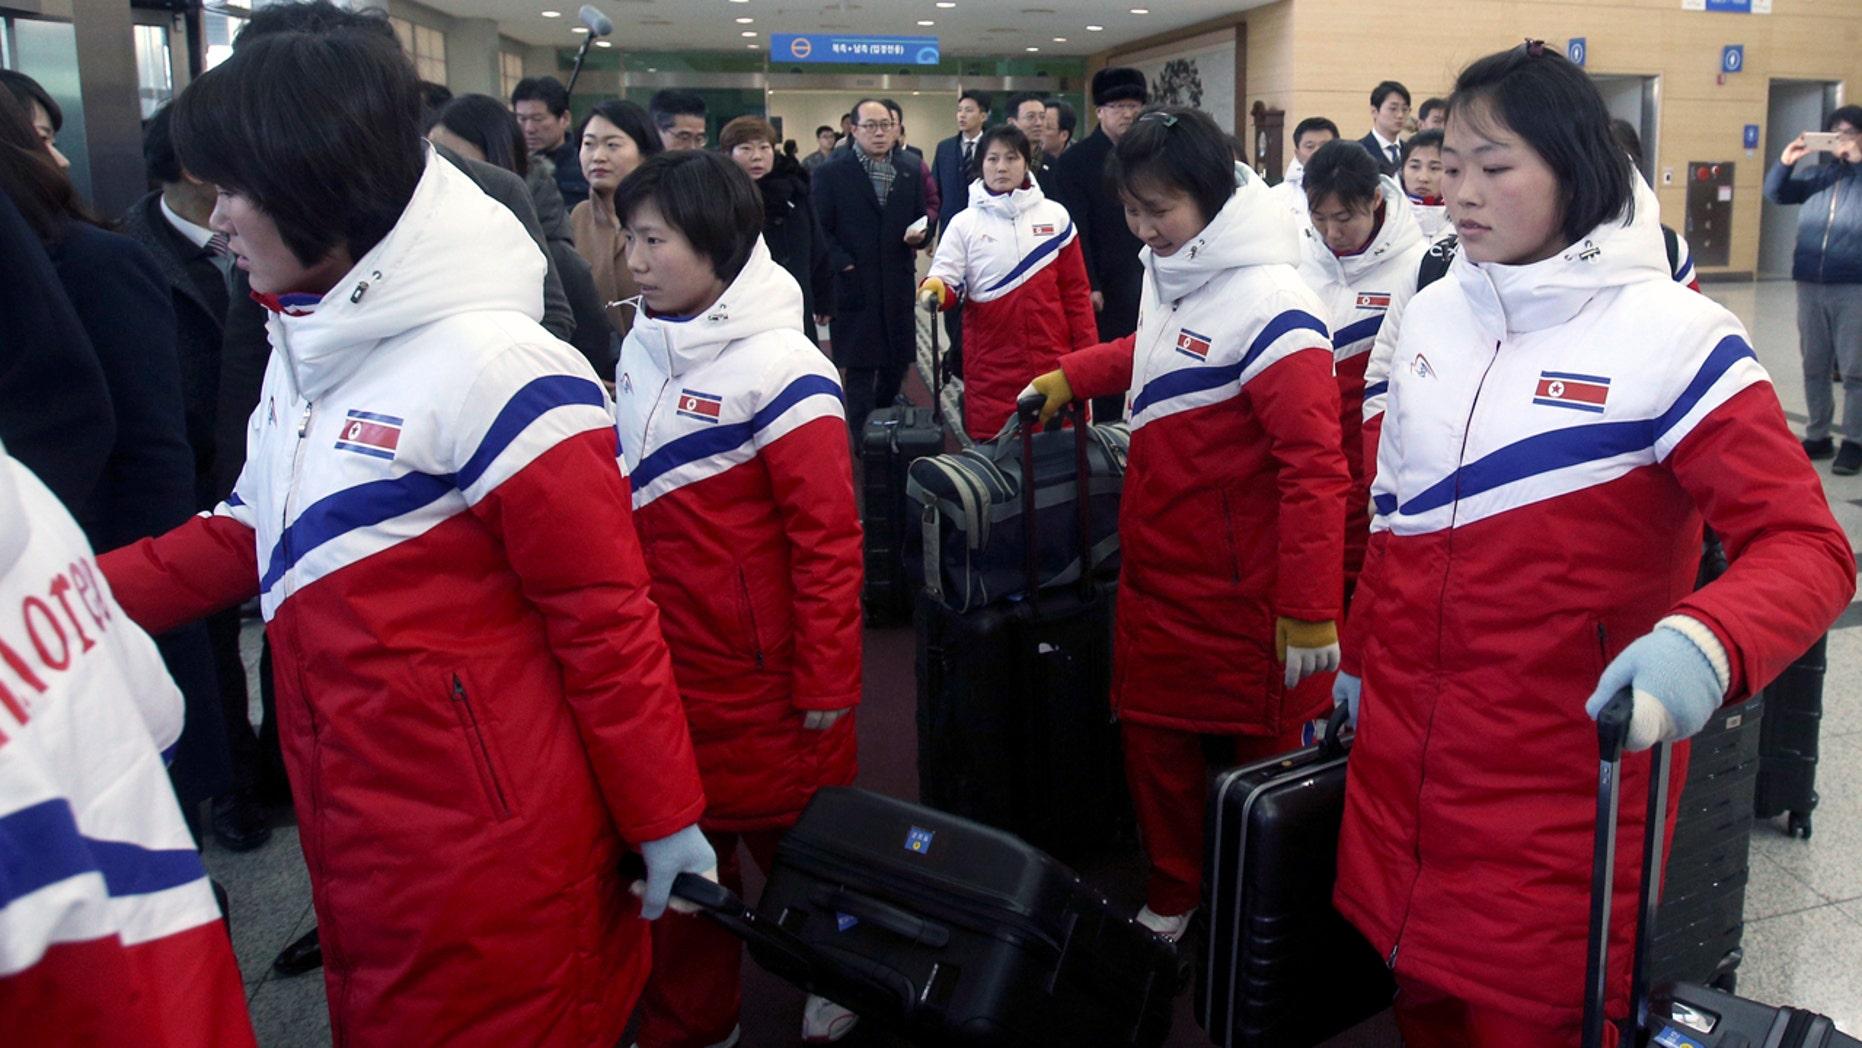 North Korean women's hockey players arrive at the Inter-Korean Transit Office in Paju, South Korea, Thursday.